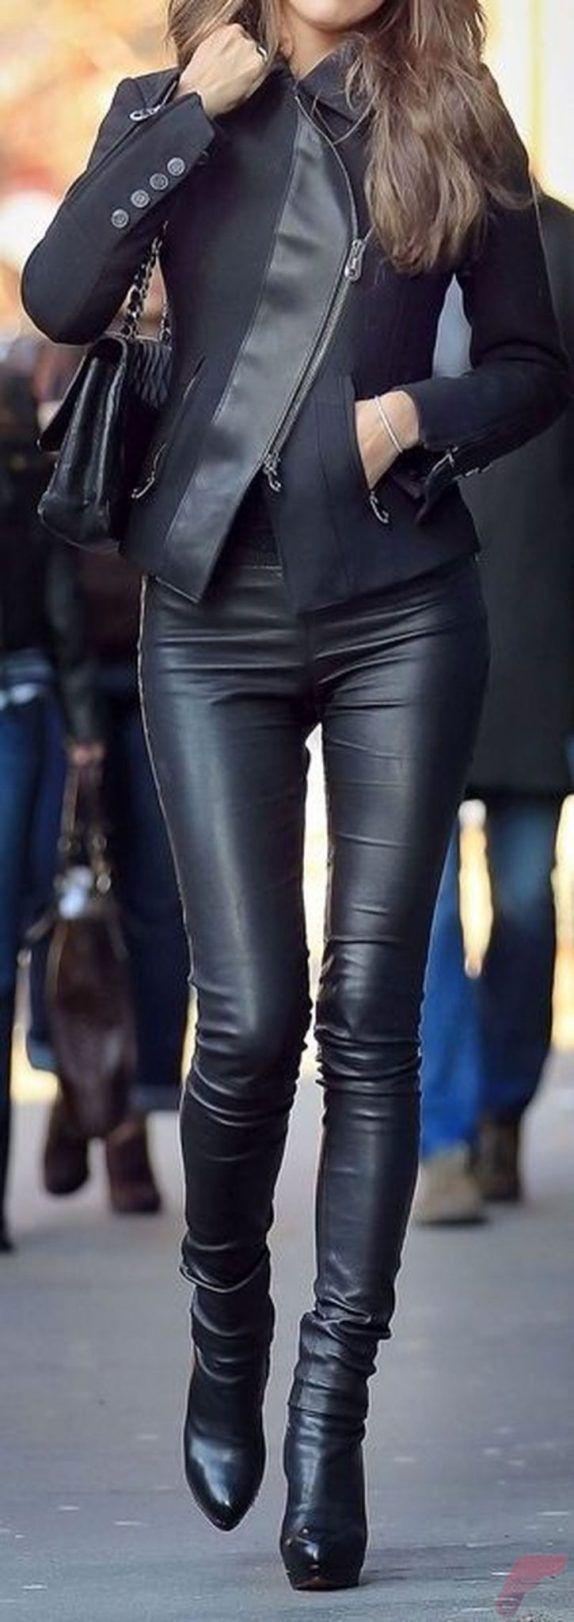 girls-stripping-black-leather-chicks